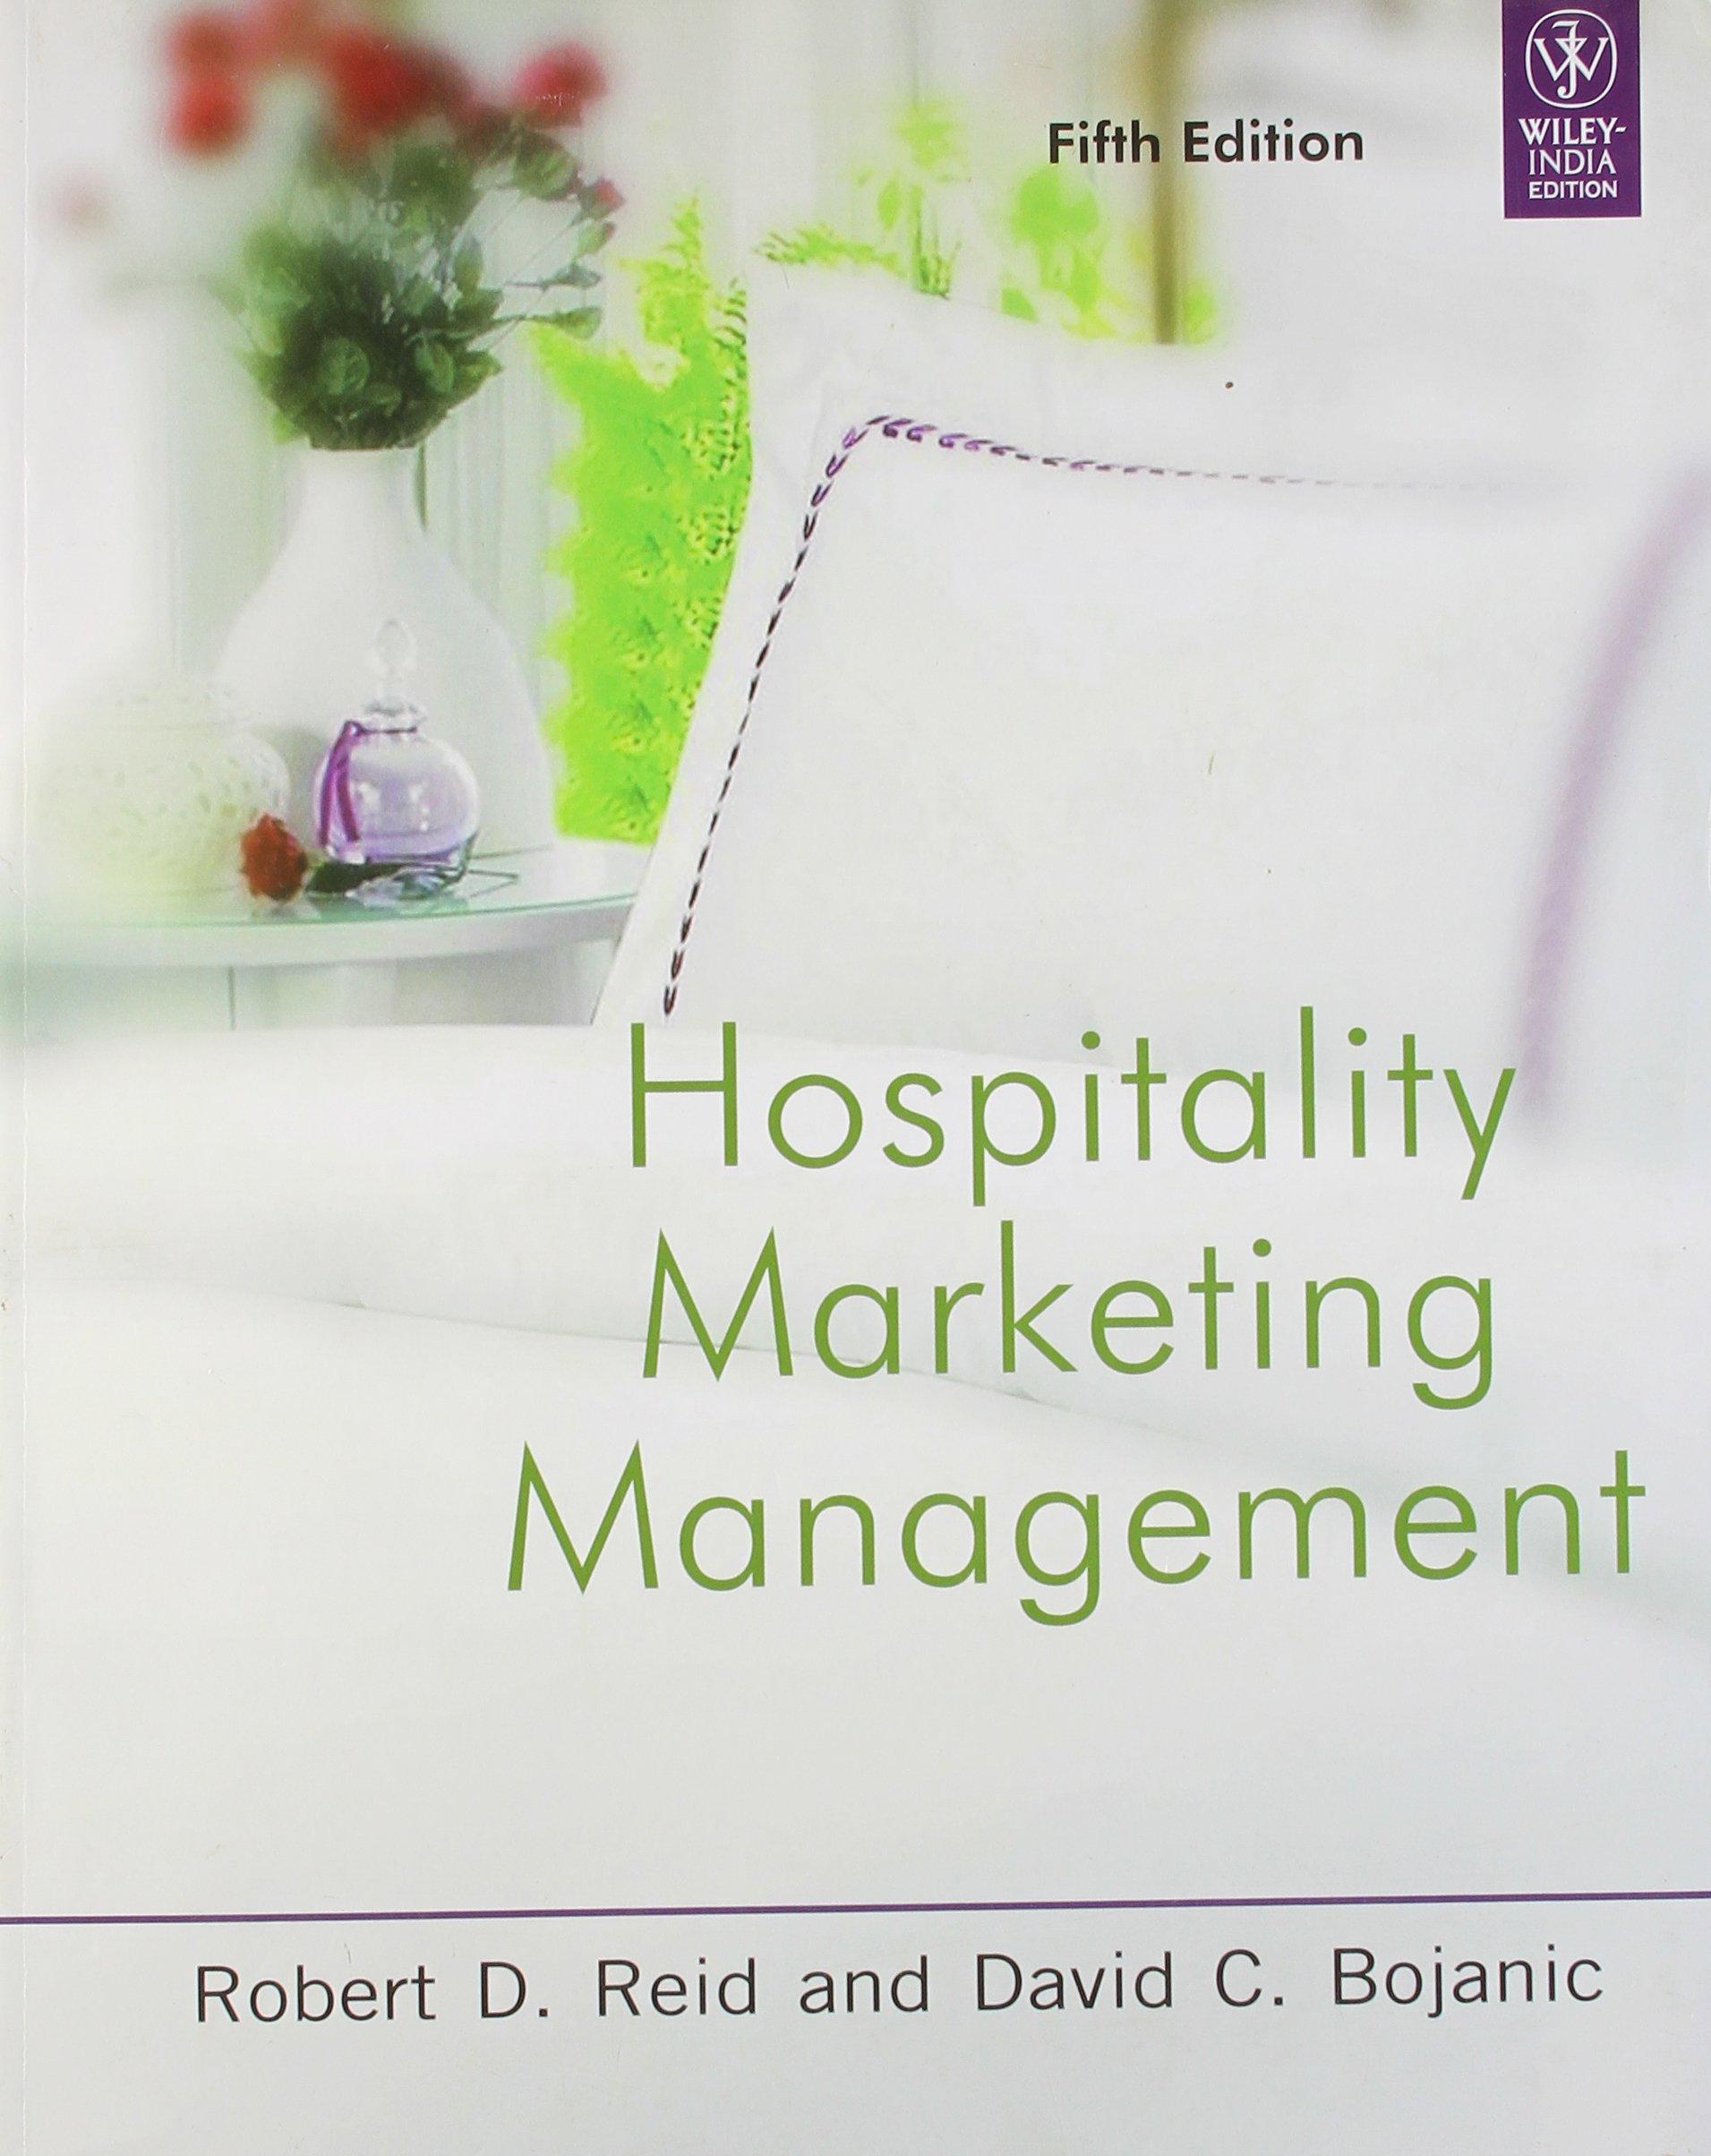 Hospitality Marketing Management 5th Edition ebook